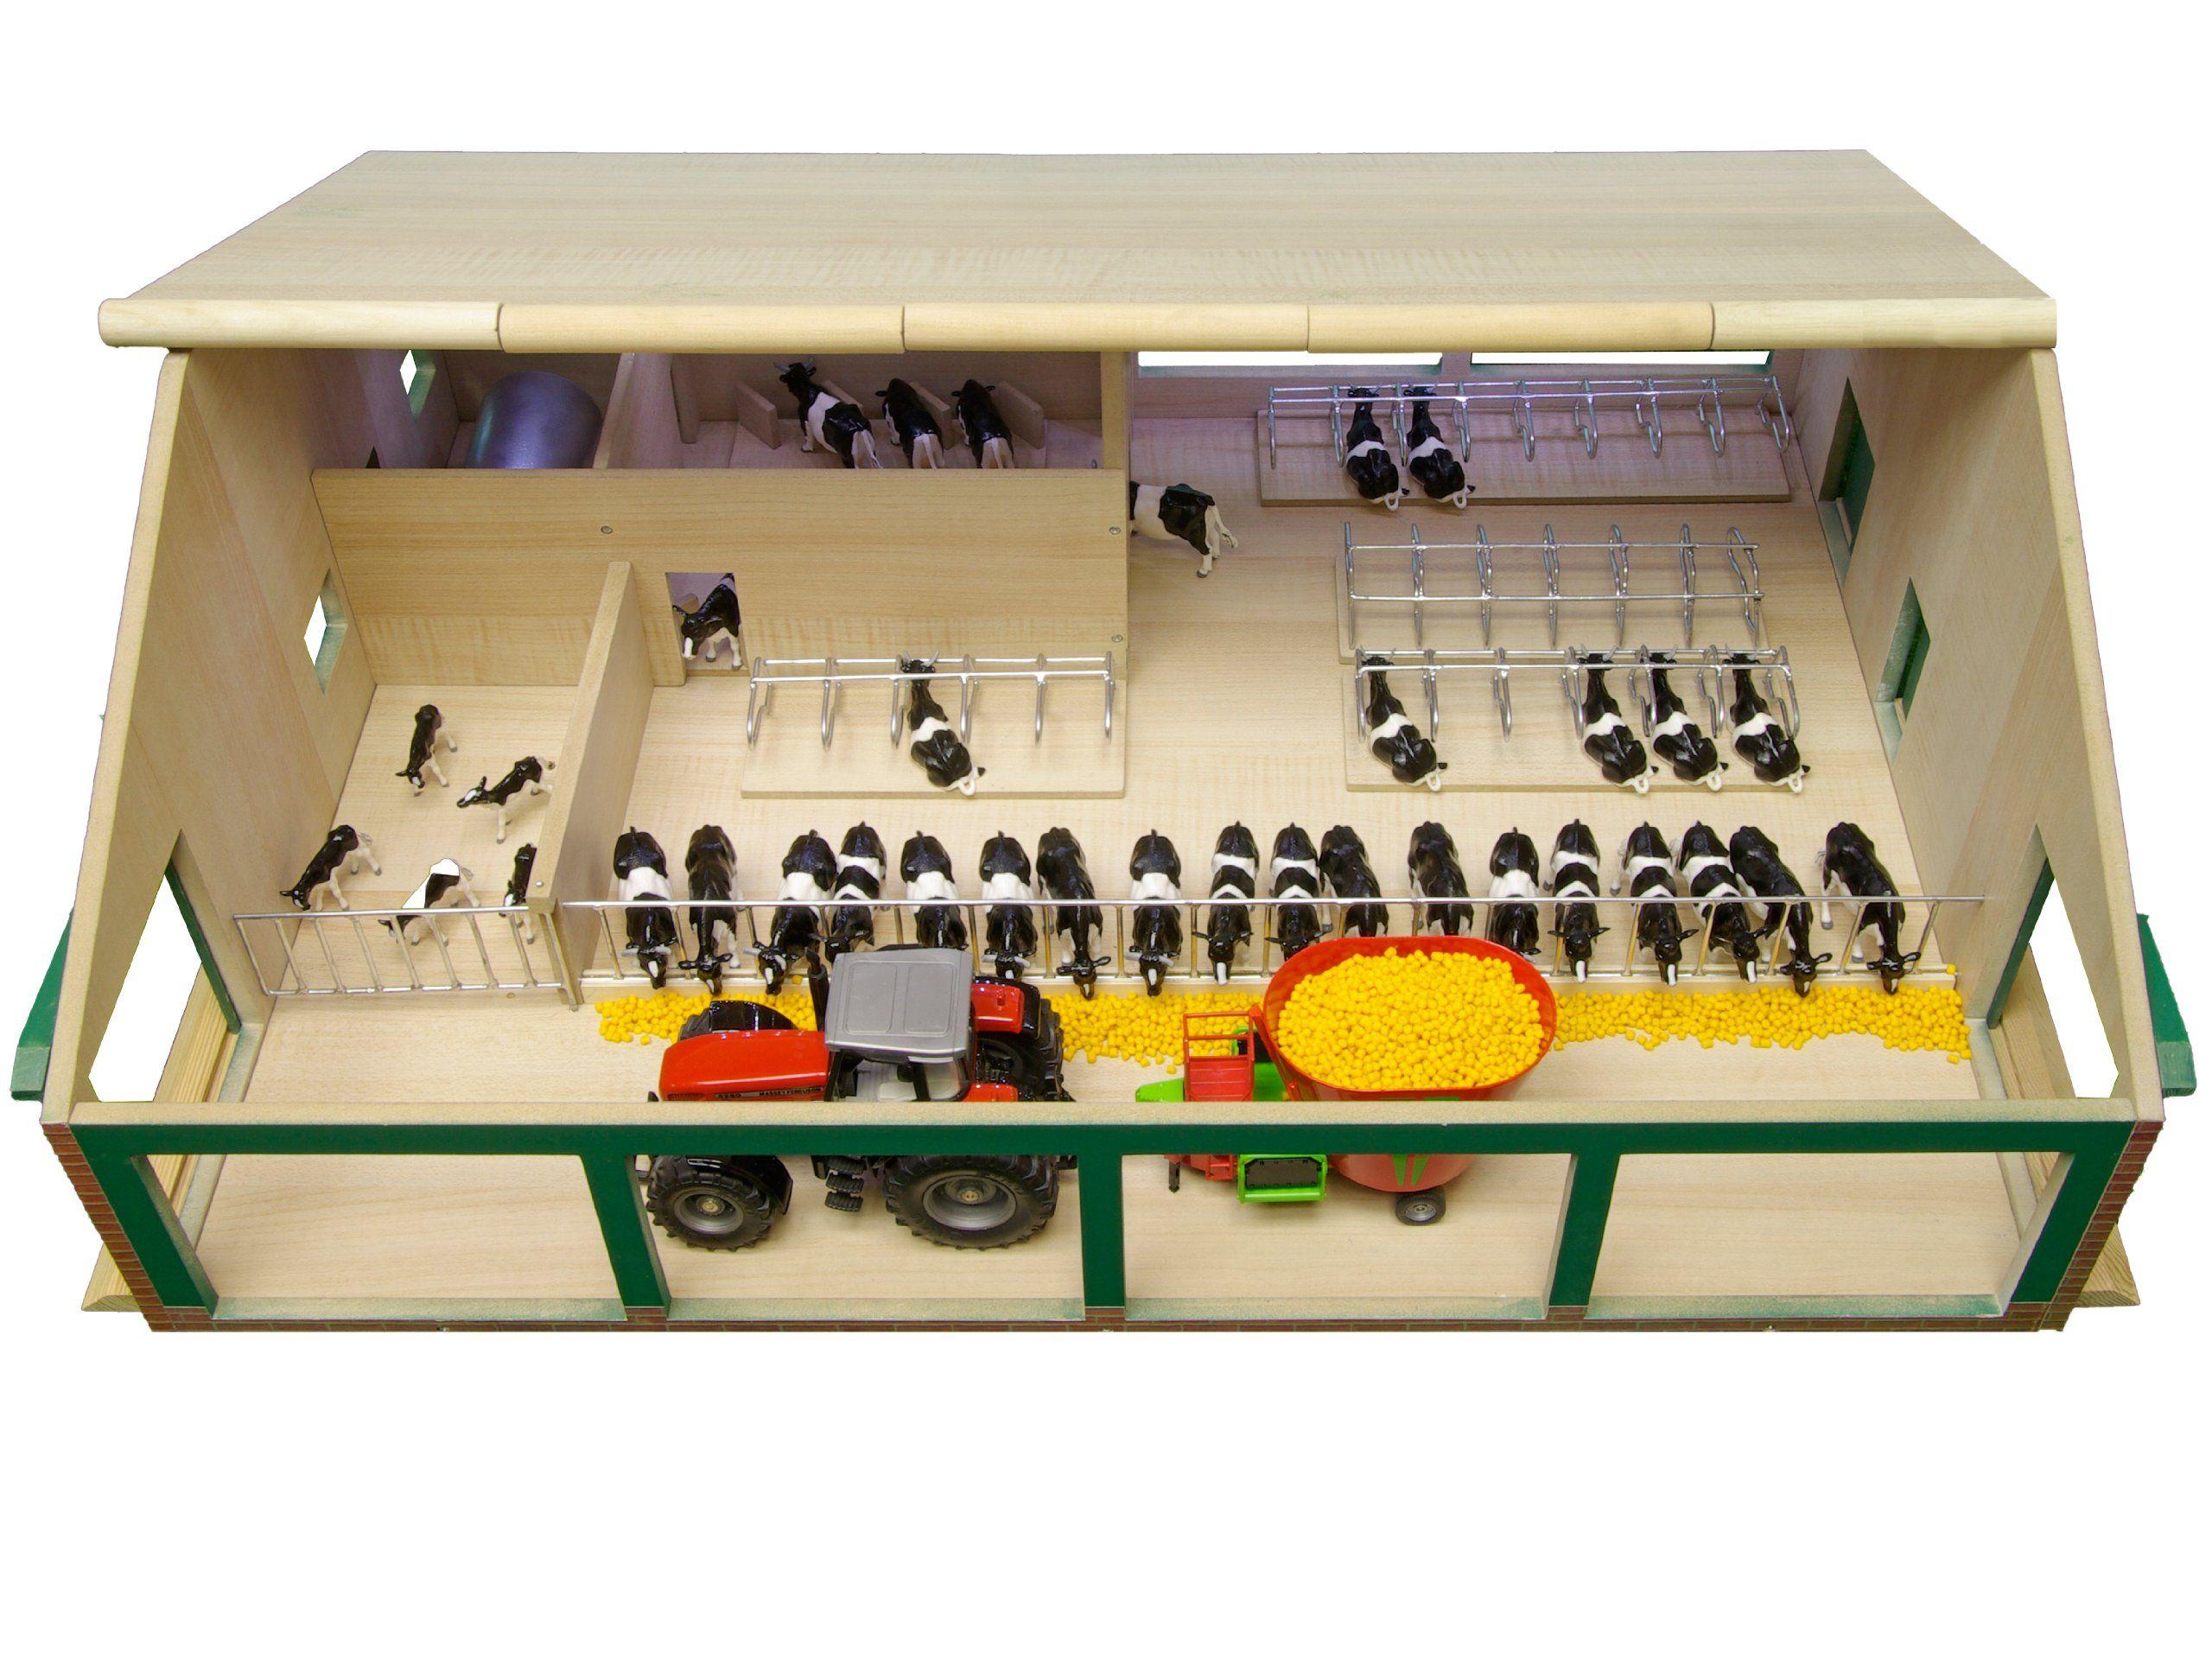 Kuhstall Spielzeug